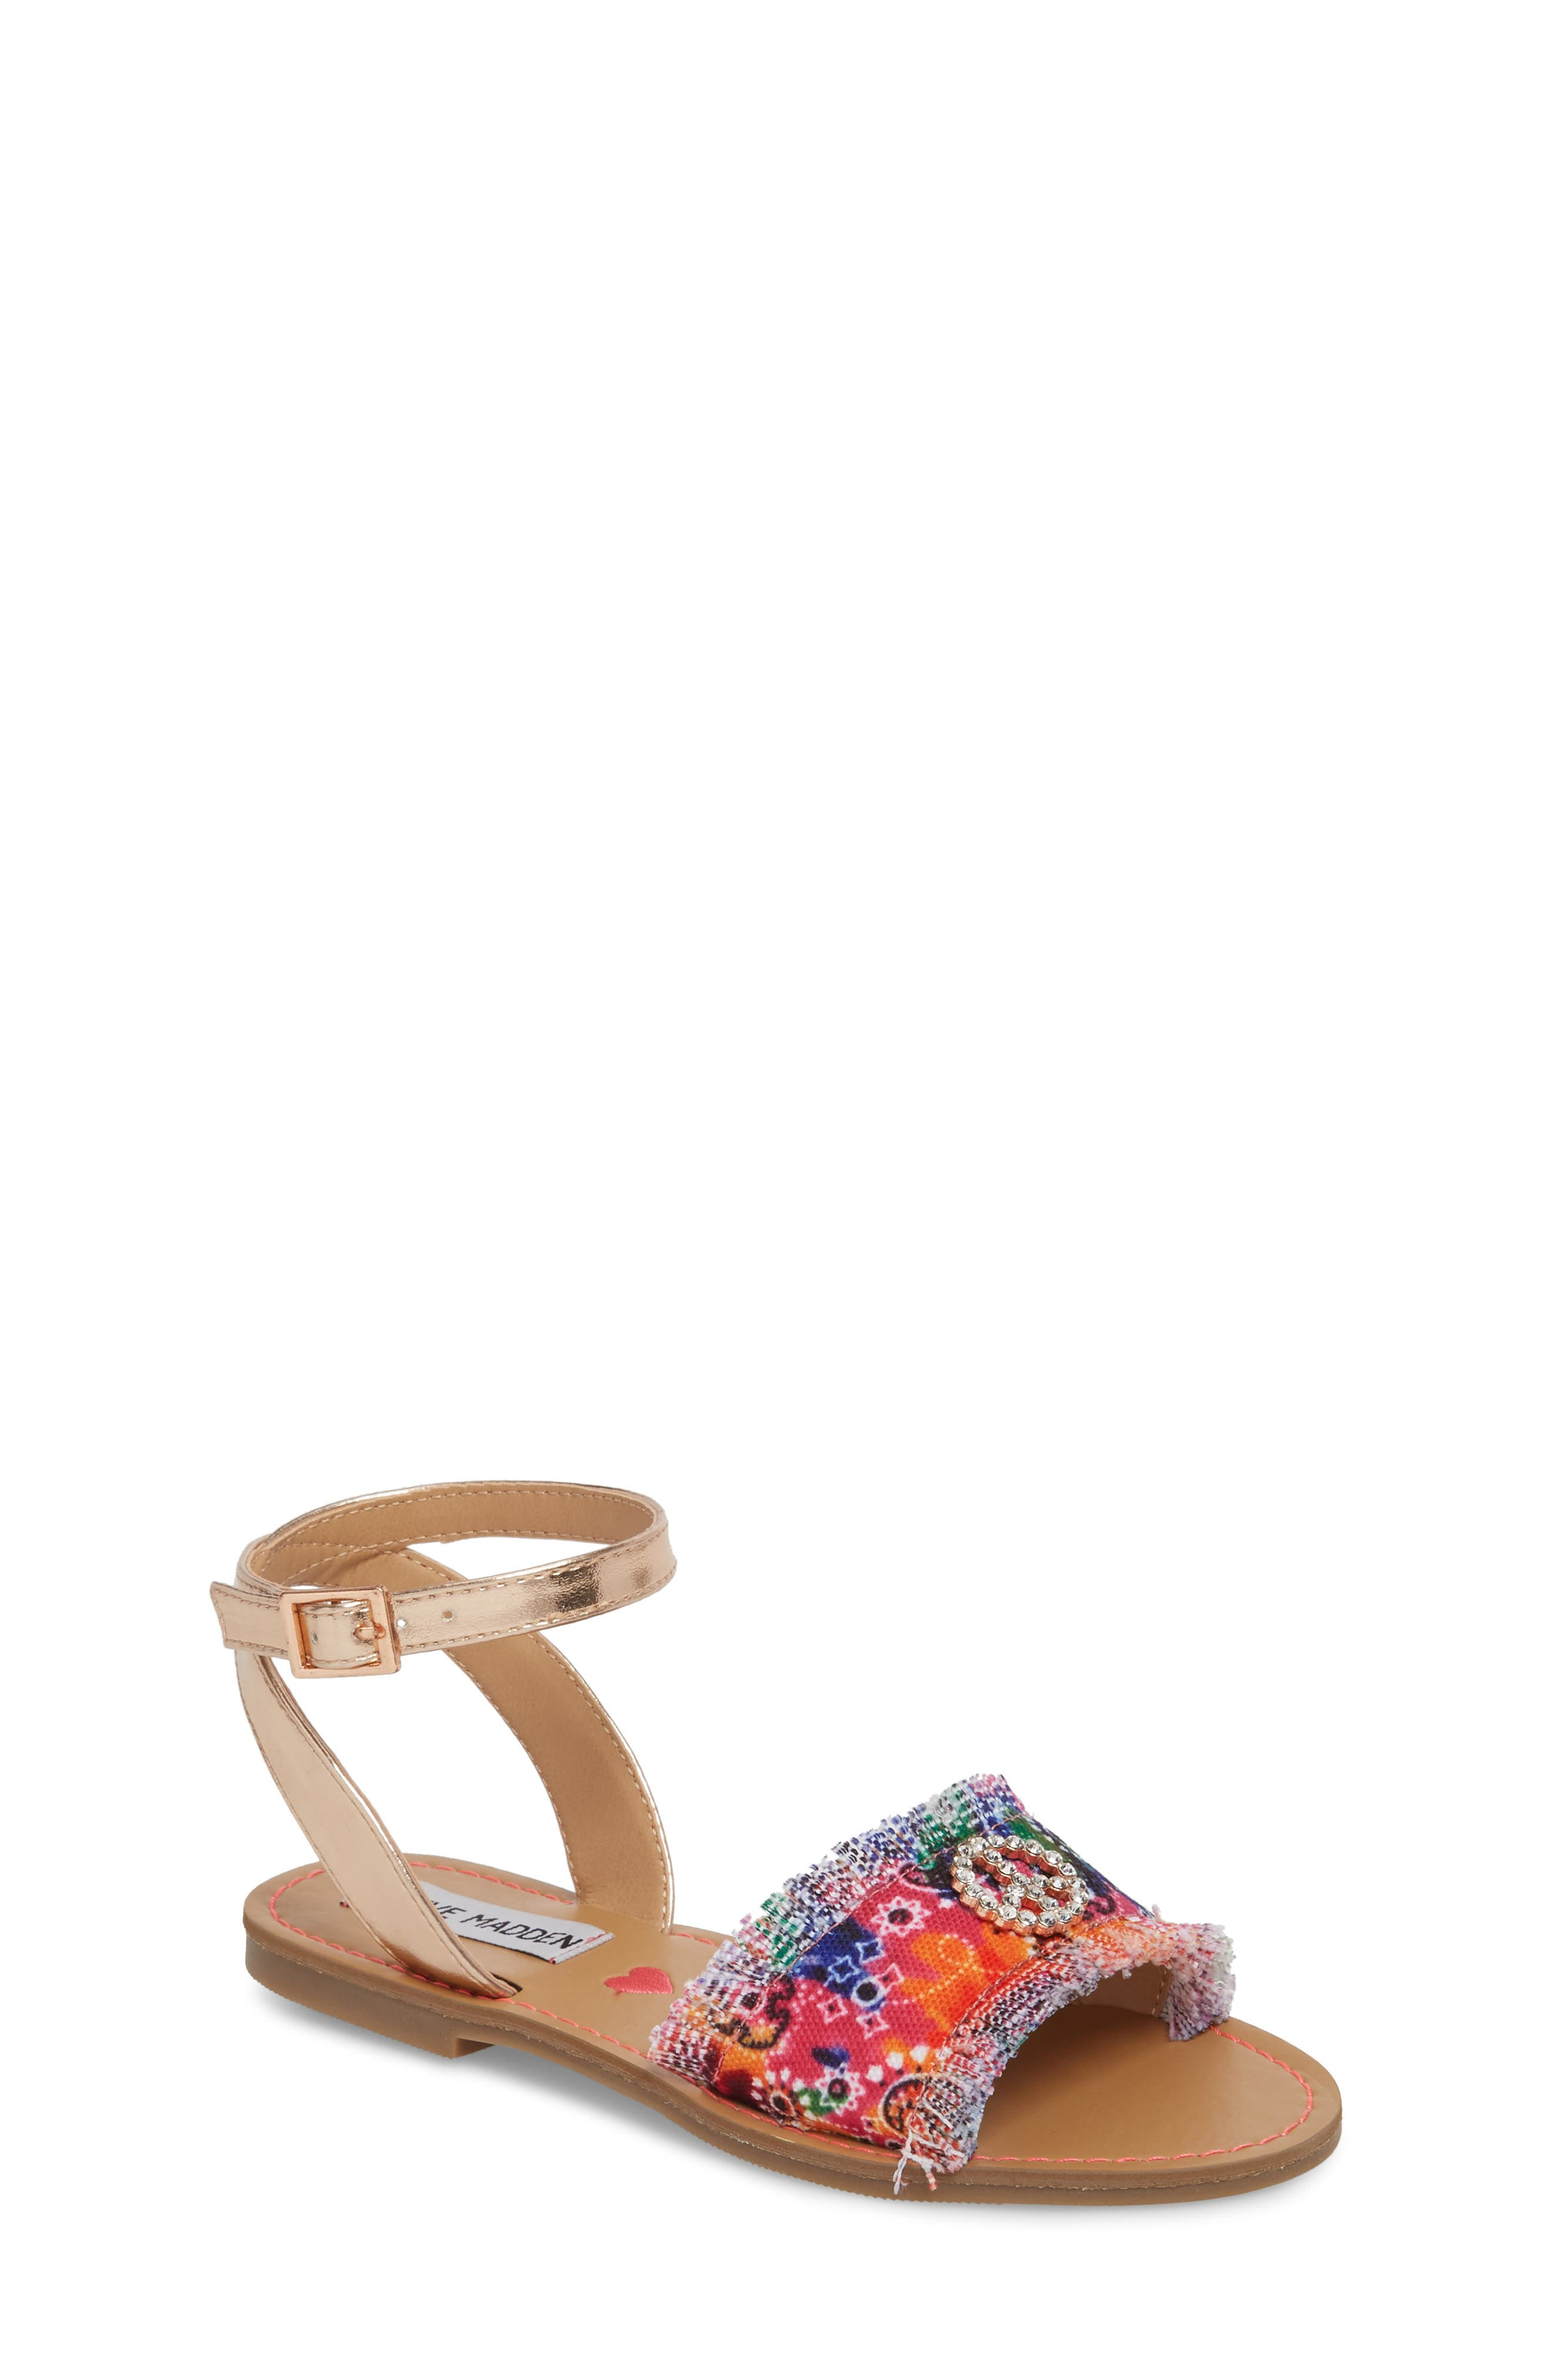 JVILLA Ankle Strap Sandal,                         Main,                         color, Tie Dye